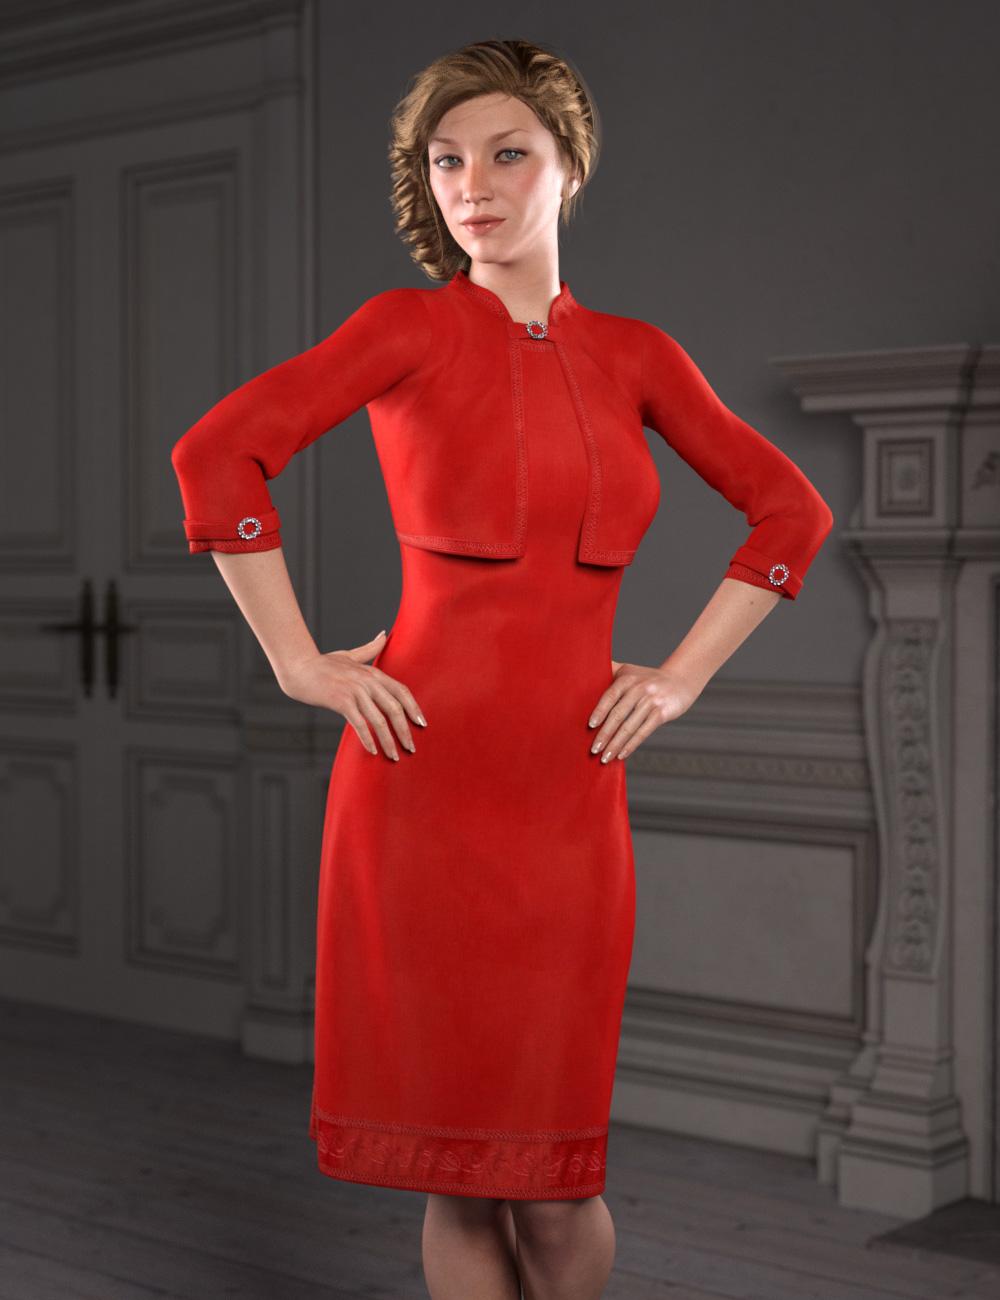 dForce Little Red Dress for Genesis 8 Female(s) by: esha, 3D Models by Daz 3D